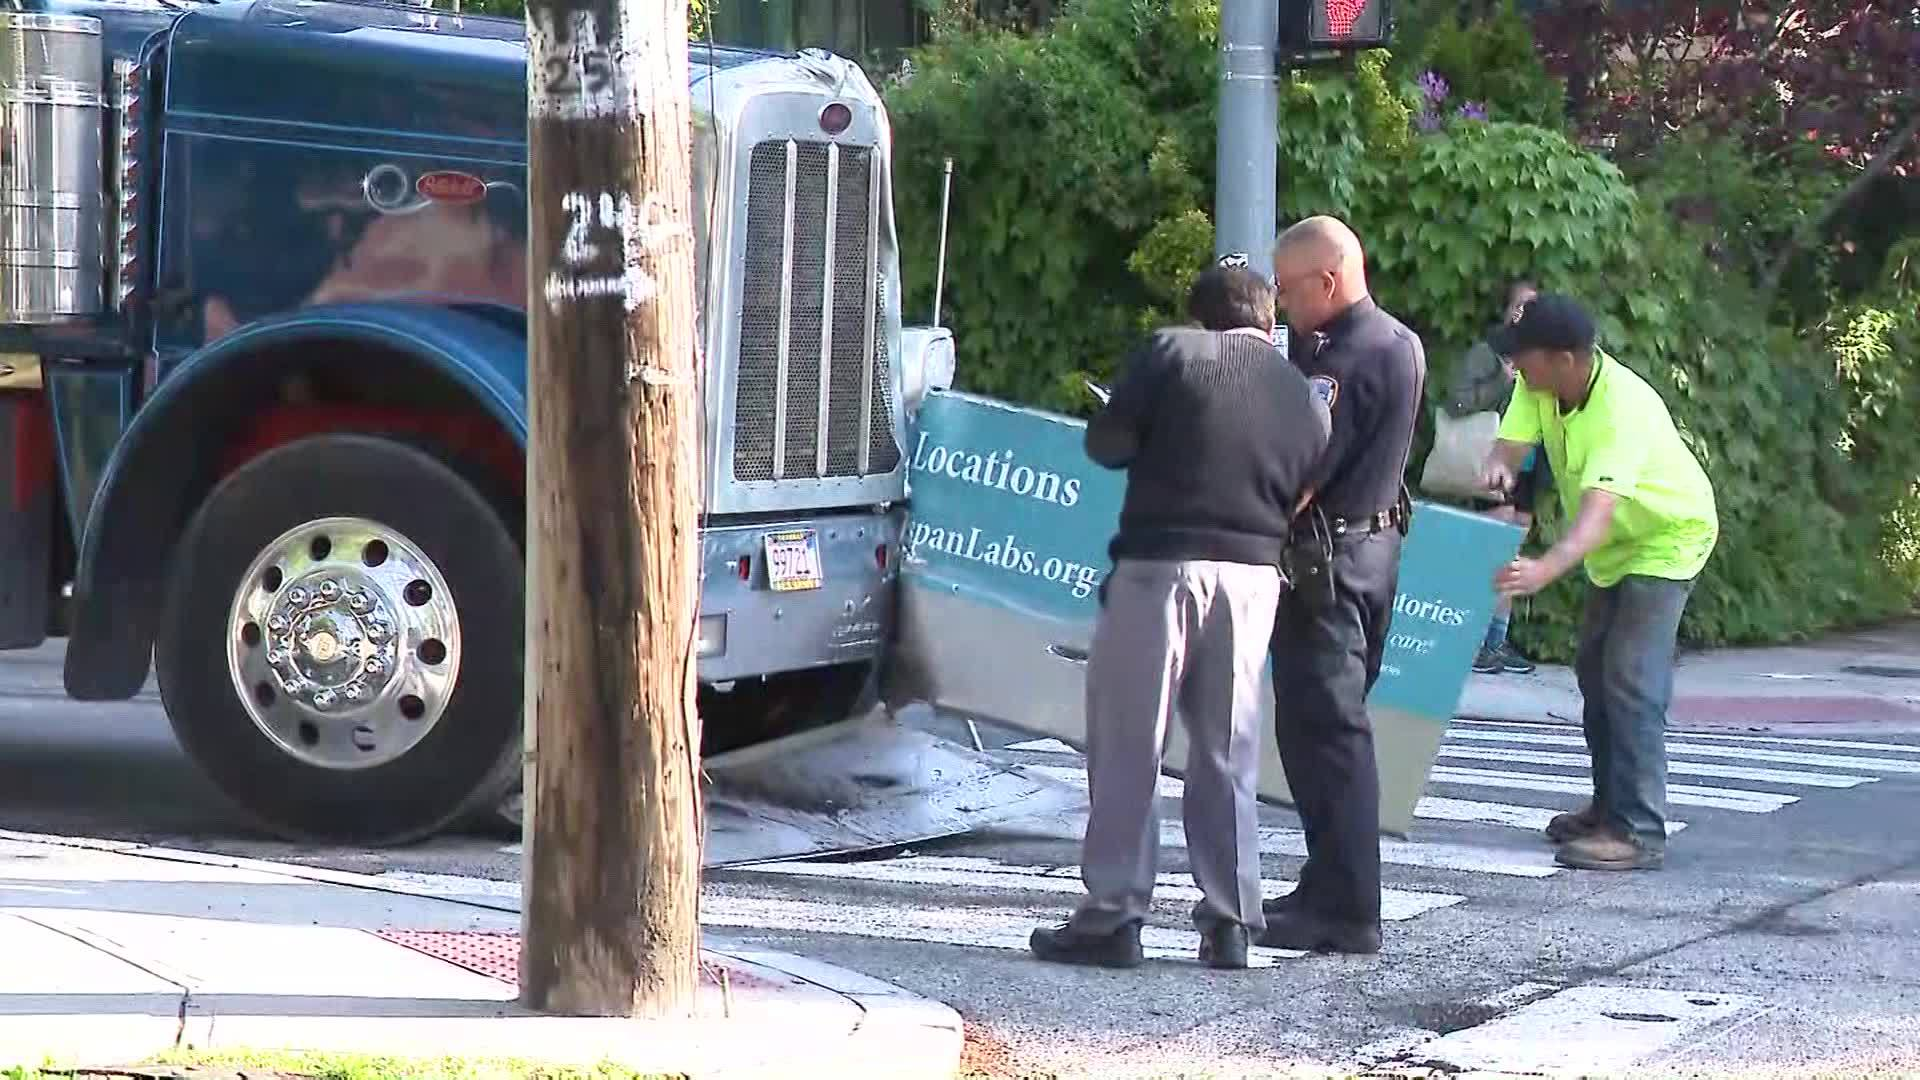 RIPTA Bus Involved in Crash on Providence's East Side